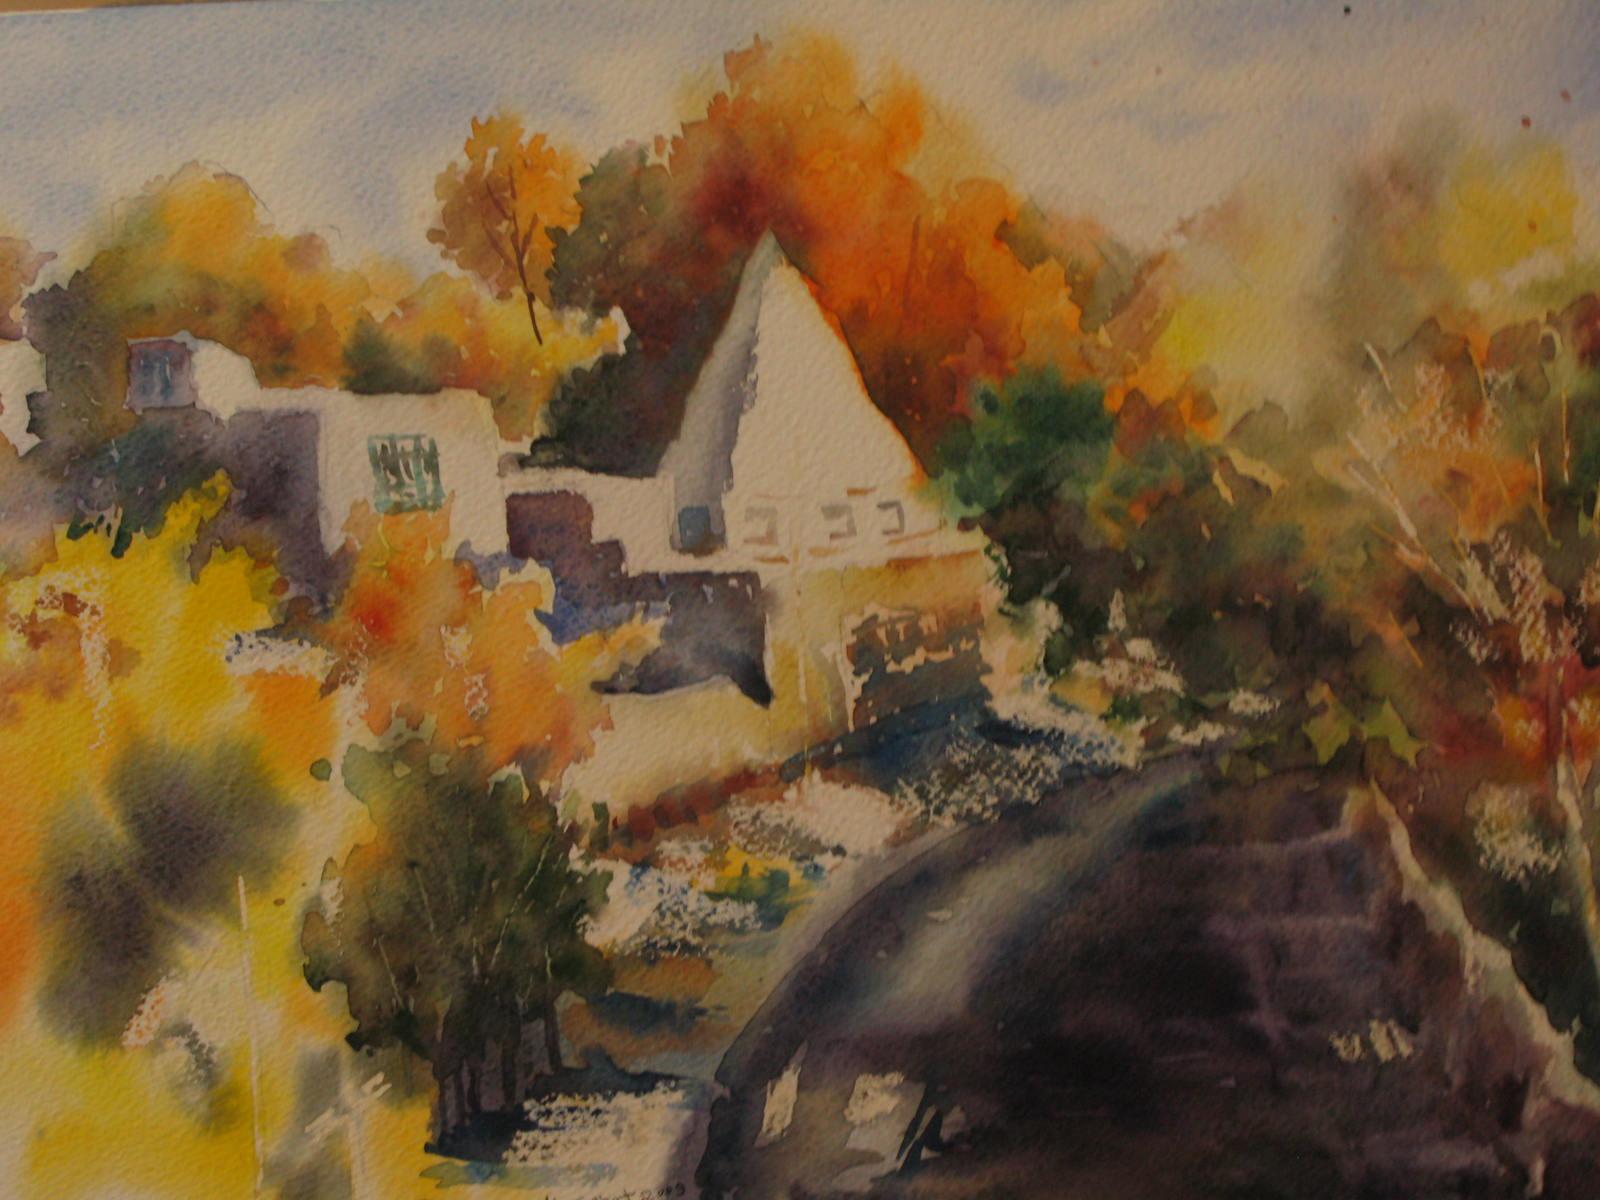 Natanz+Iran+35x53+cm+watercolor.JPG